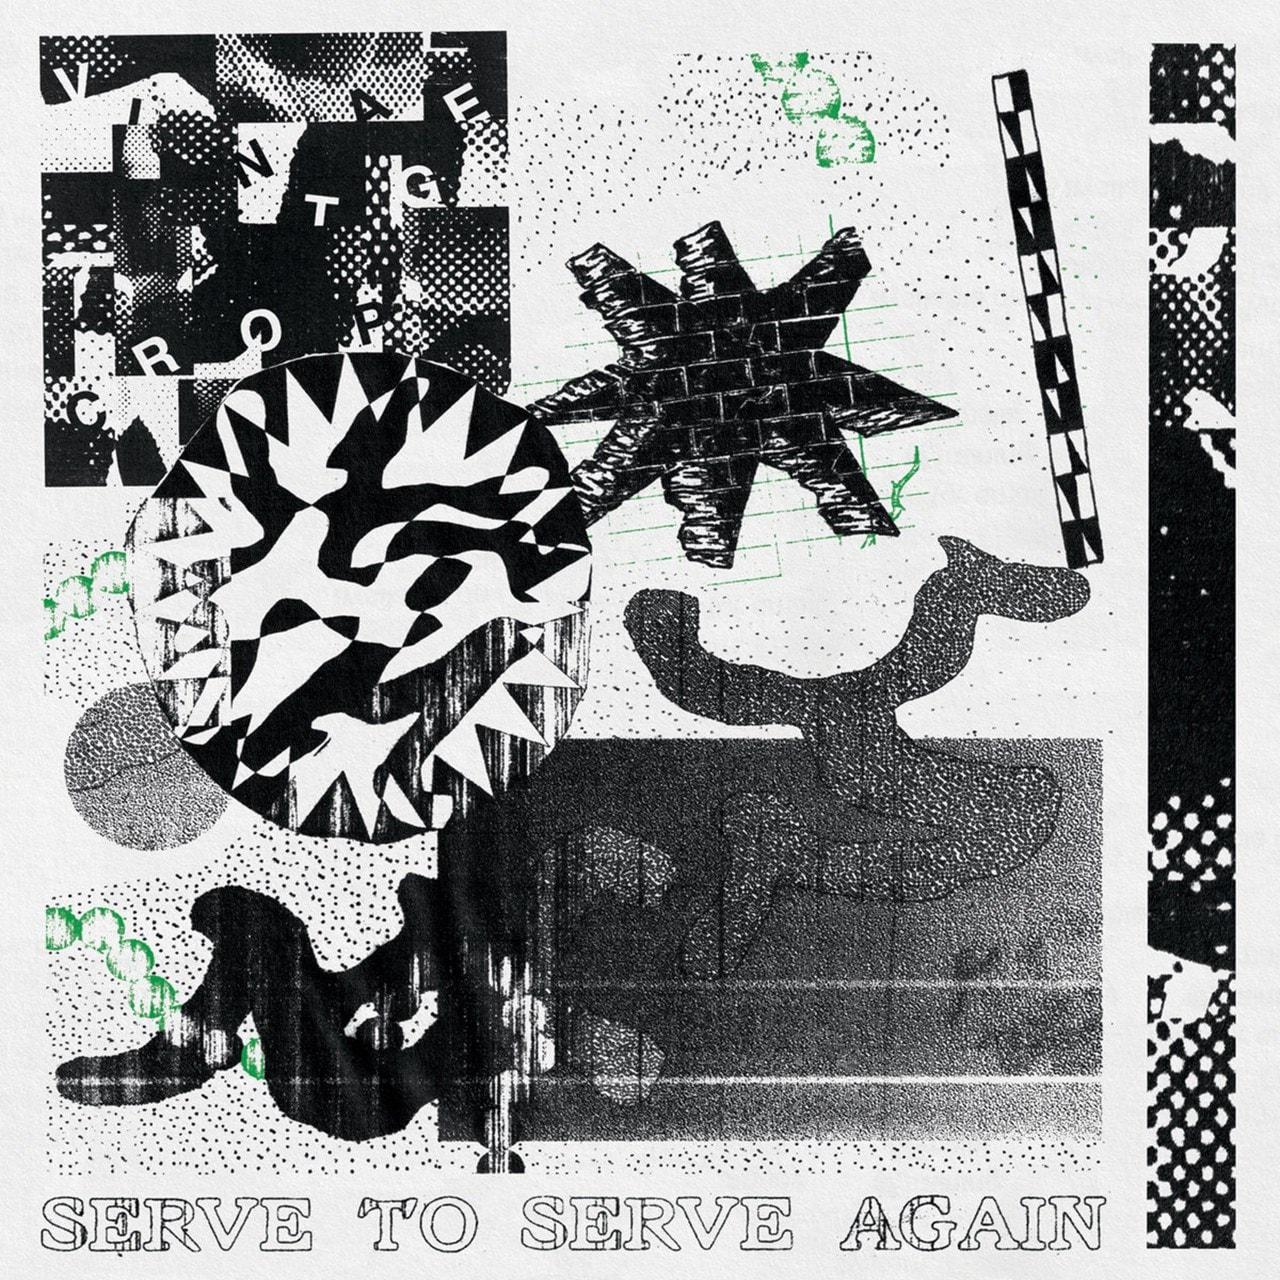 Serve to Serve Again - 1